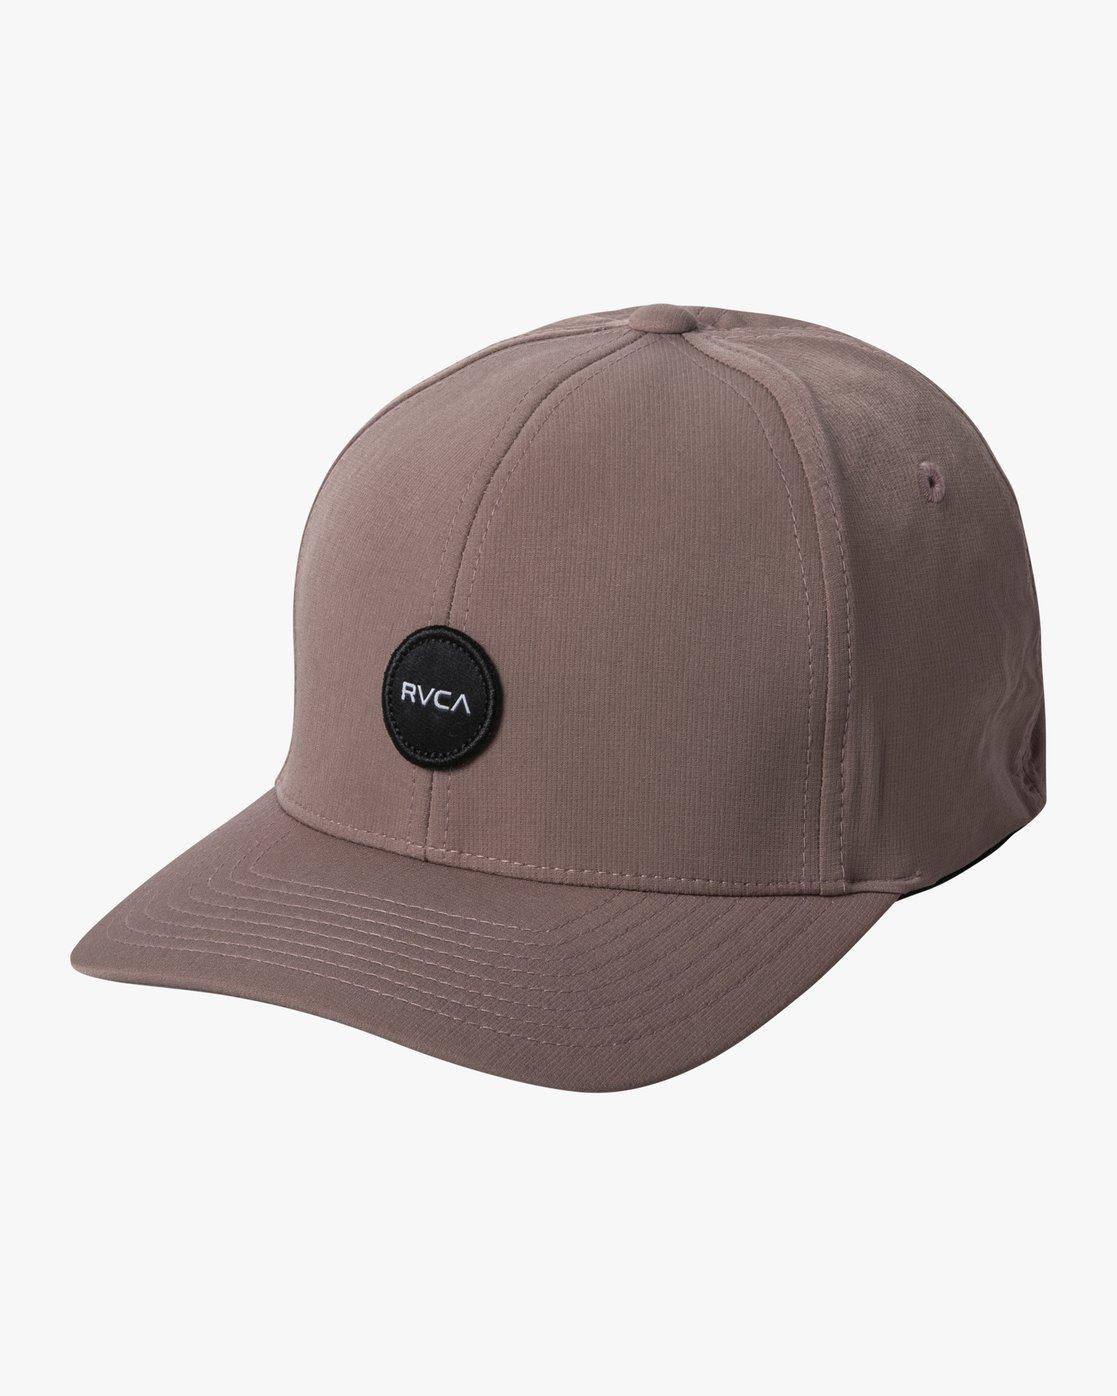 0 SHANE FLEXFIT HAT Purple MAHW3RSF RVCA